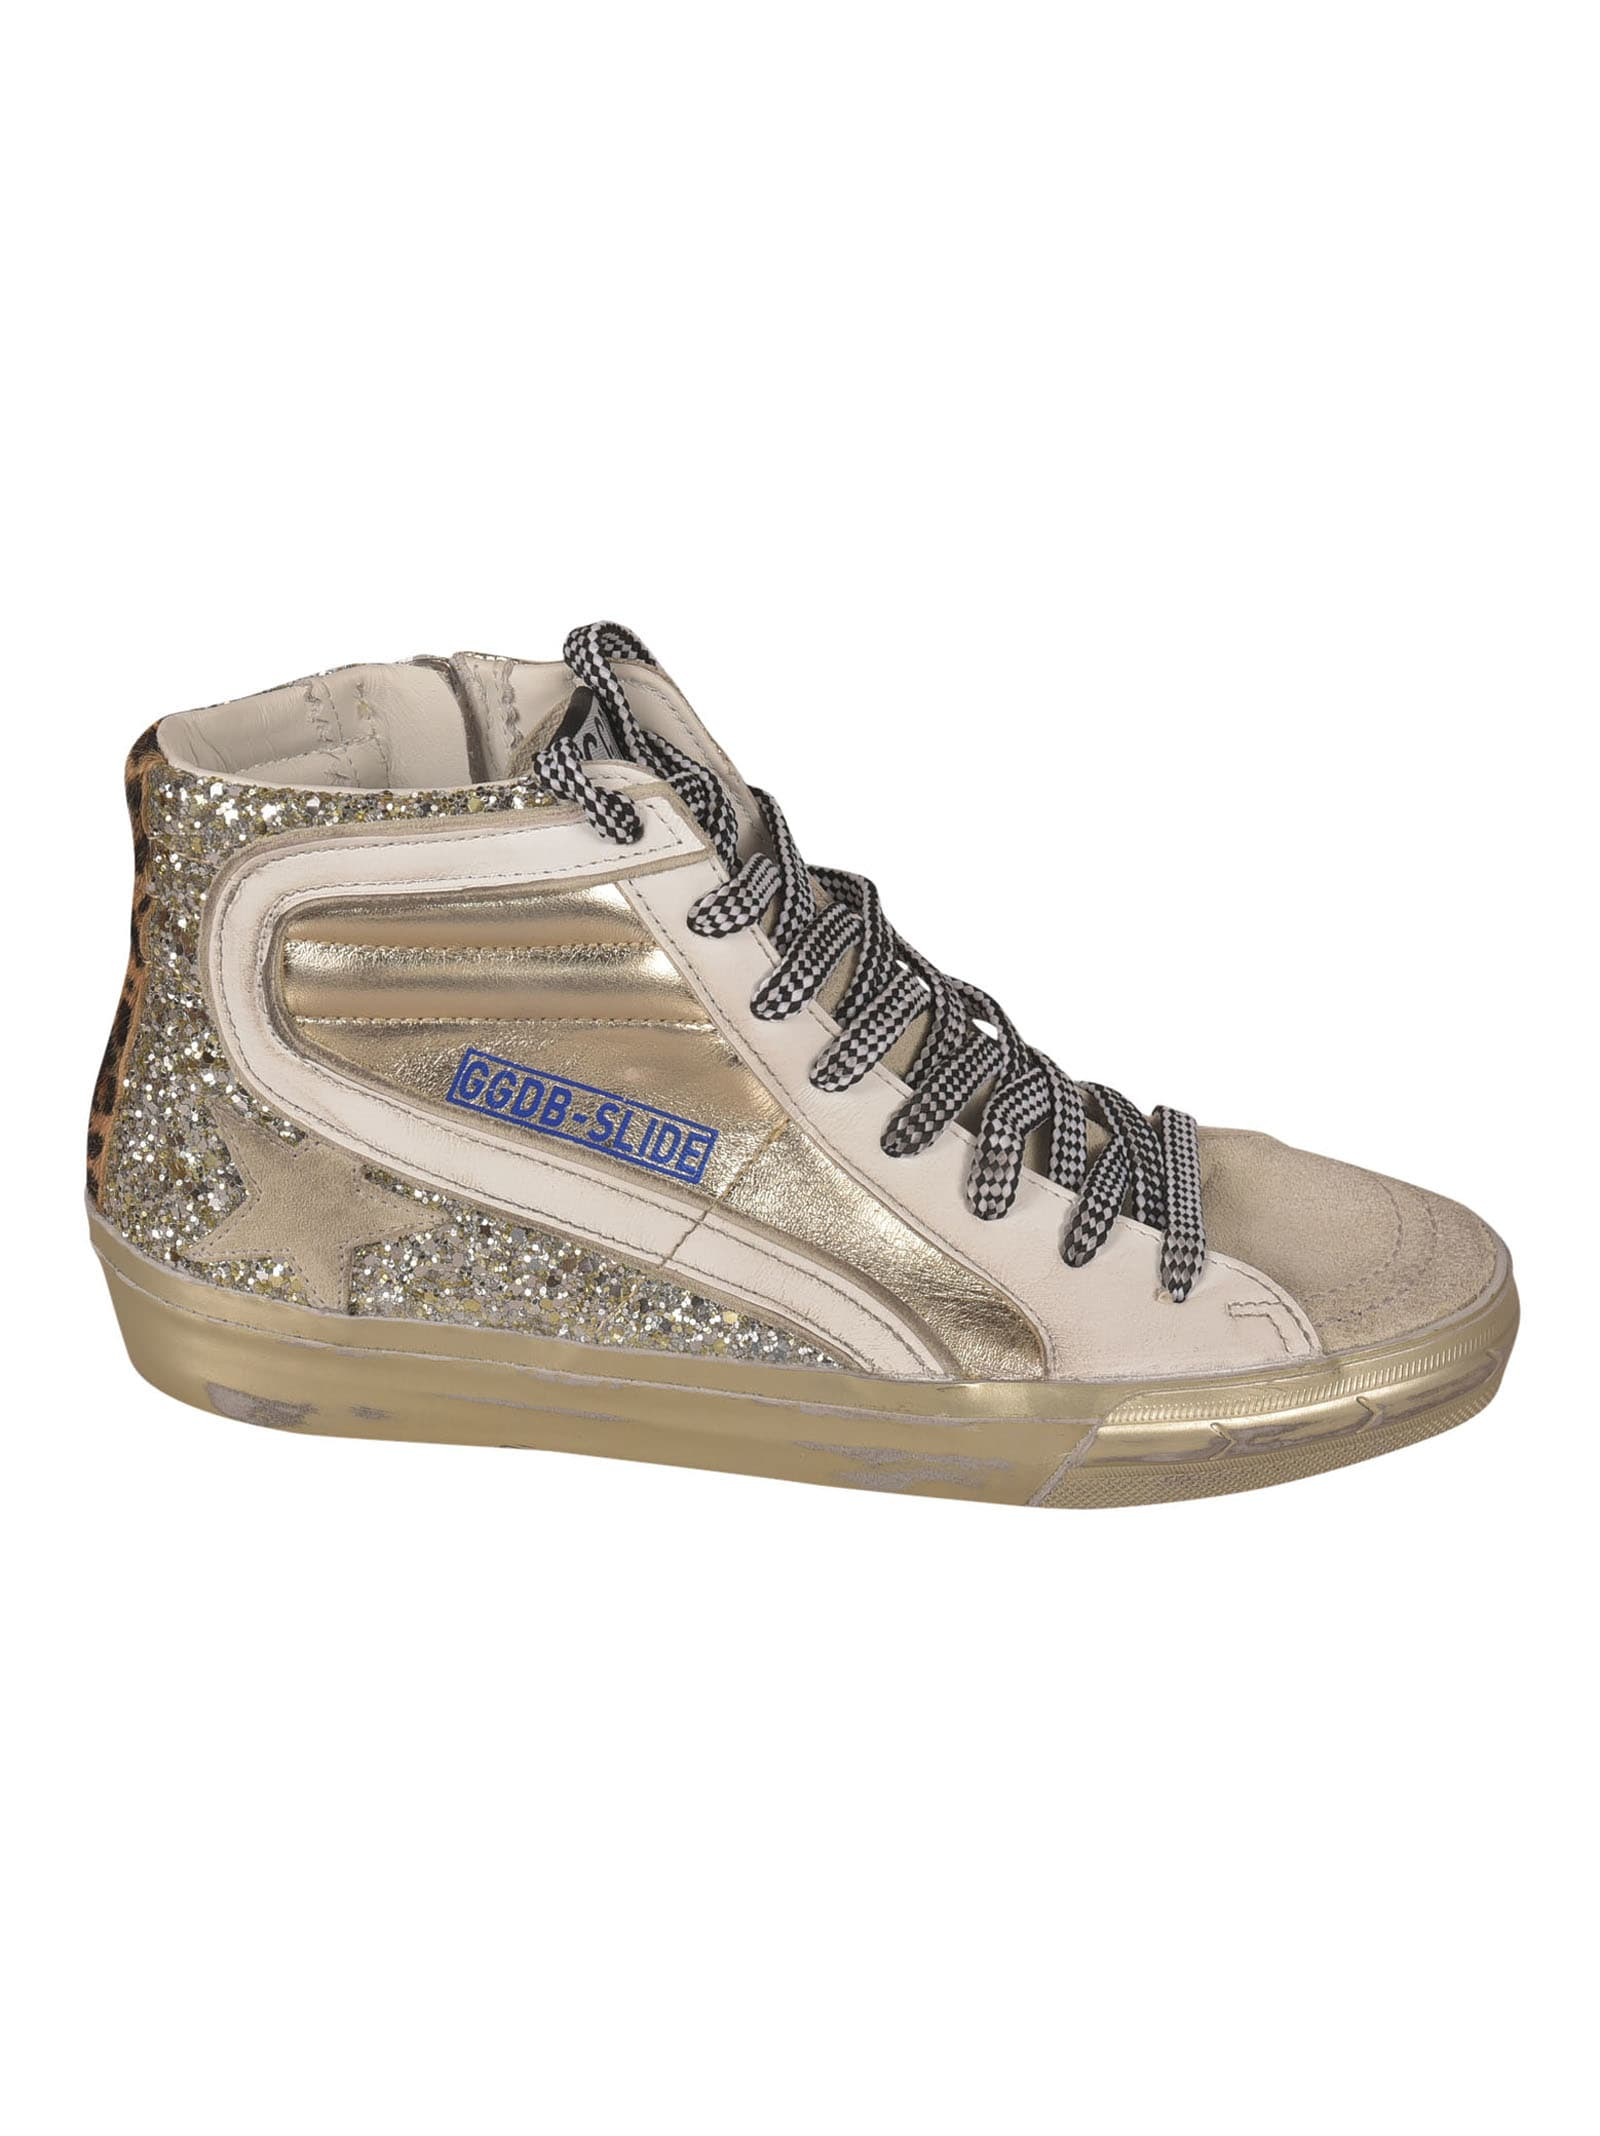 Golden Goose Side Double Quarter Sneakers